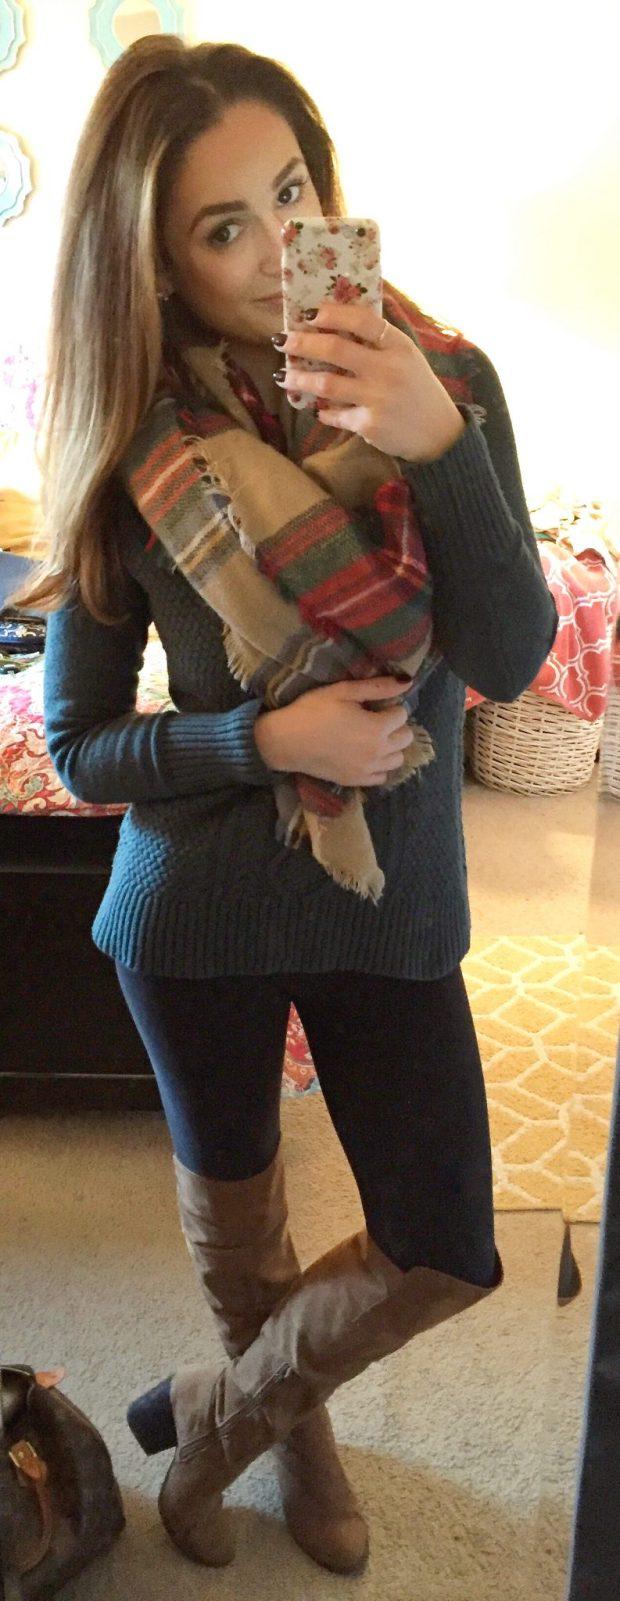 Sweater: Target // Leggings: Walmart // Boots: Forever 21 // Blanket Scarf: Original - KnitPopSop